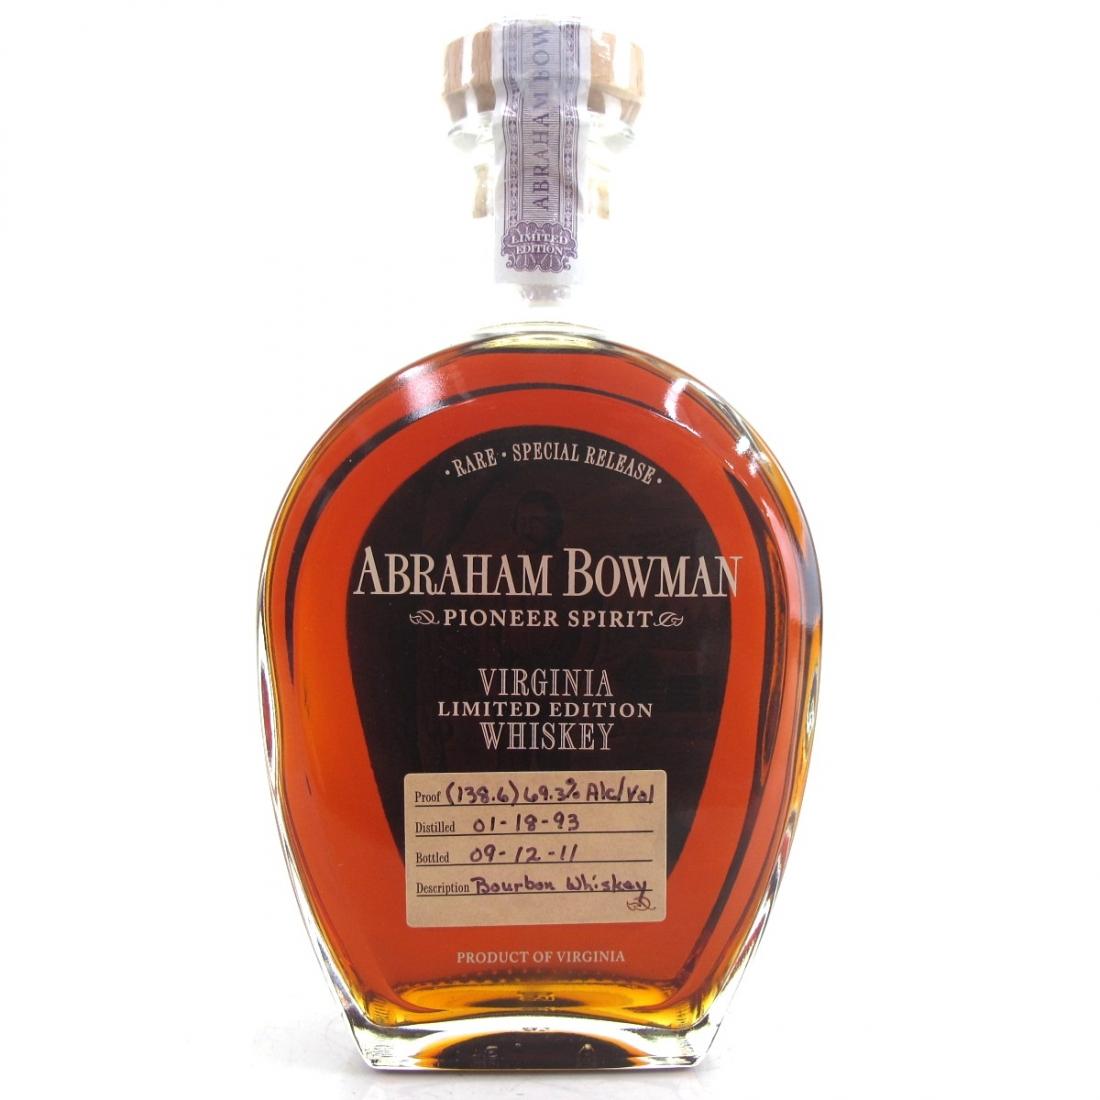 Abraham Bowman 1993 Cask Strength 18 Year Old Bourbon